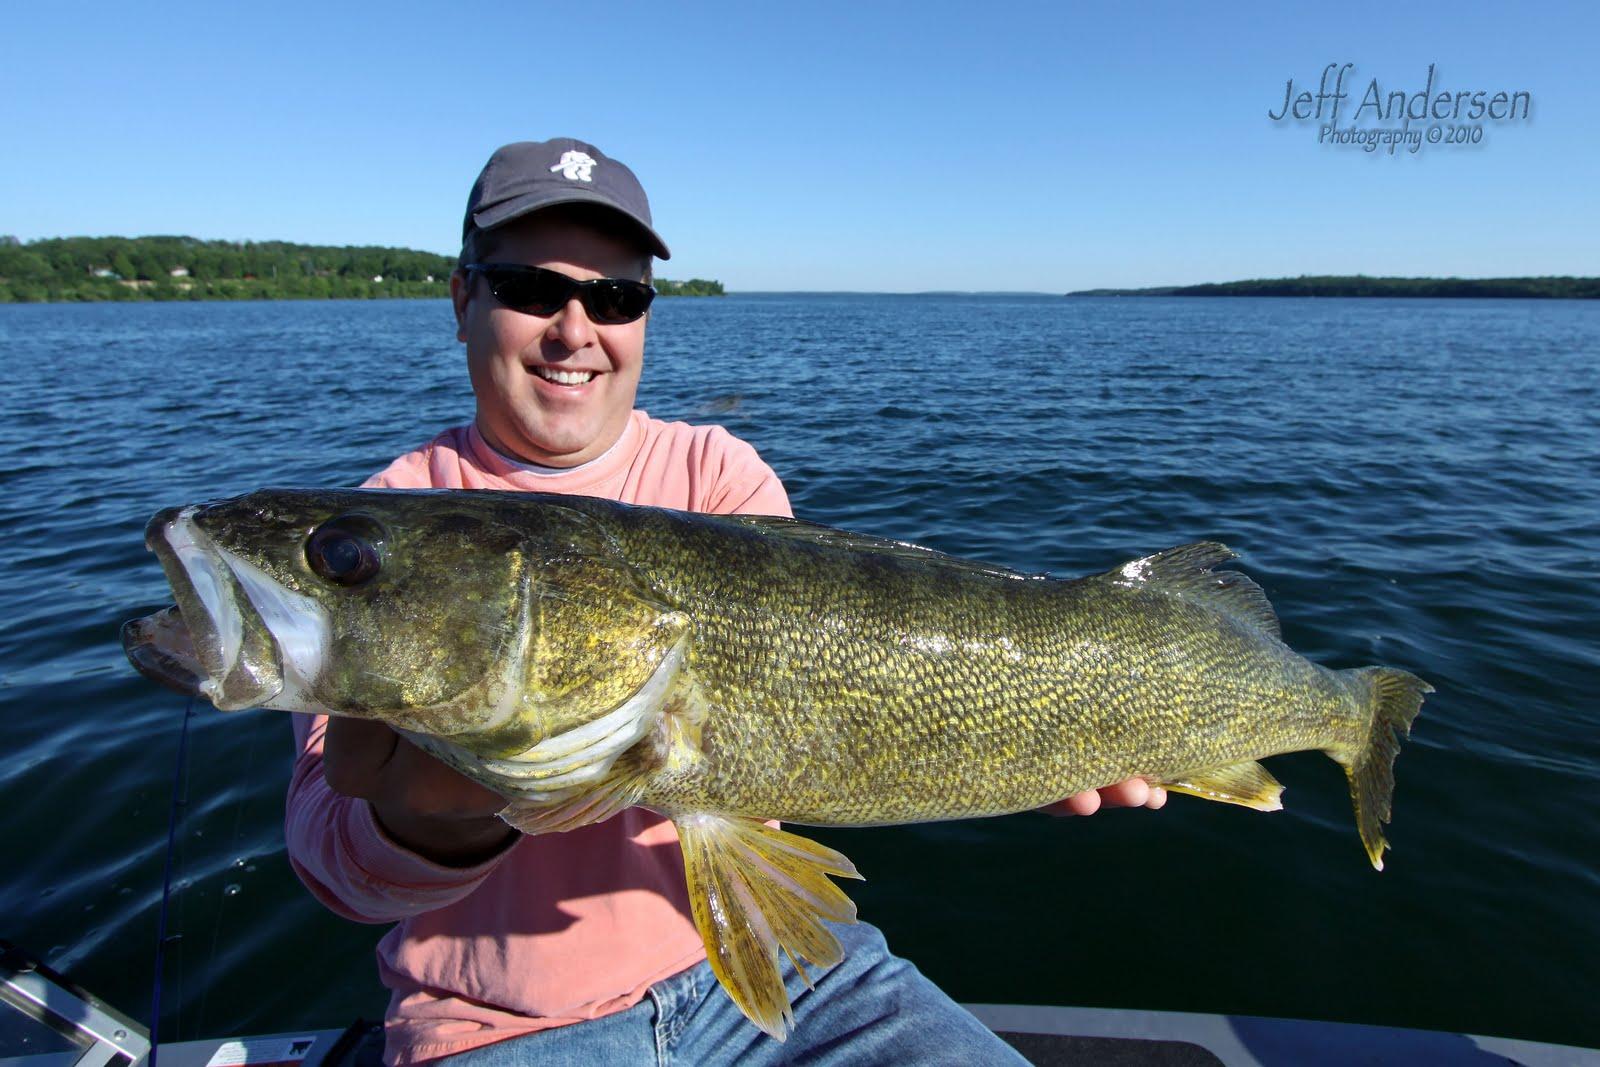 Lake fishing photography